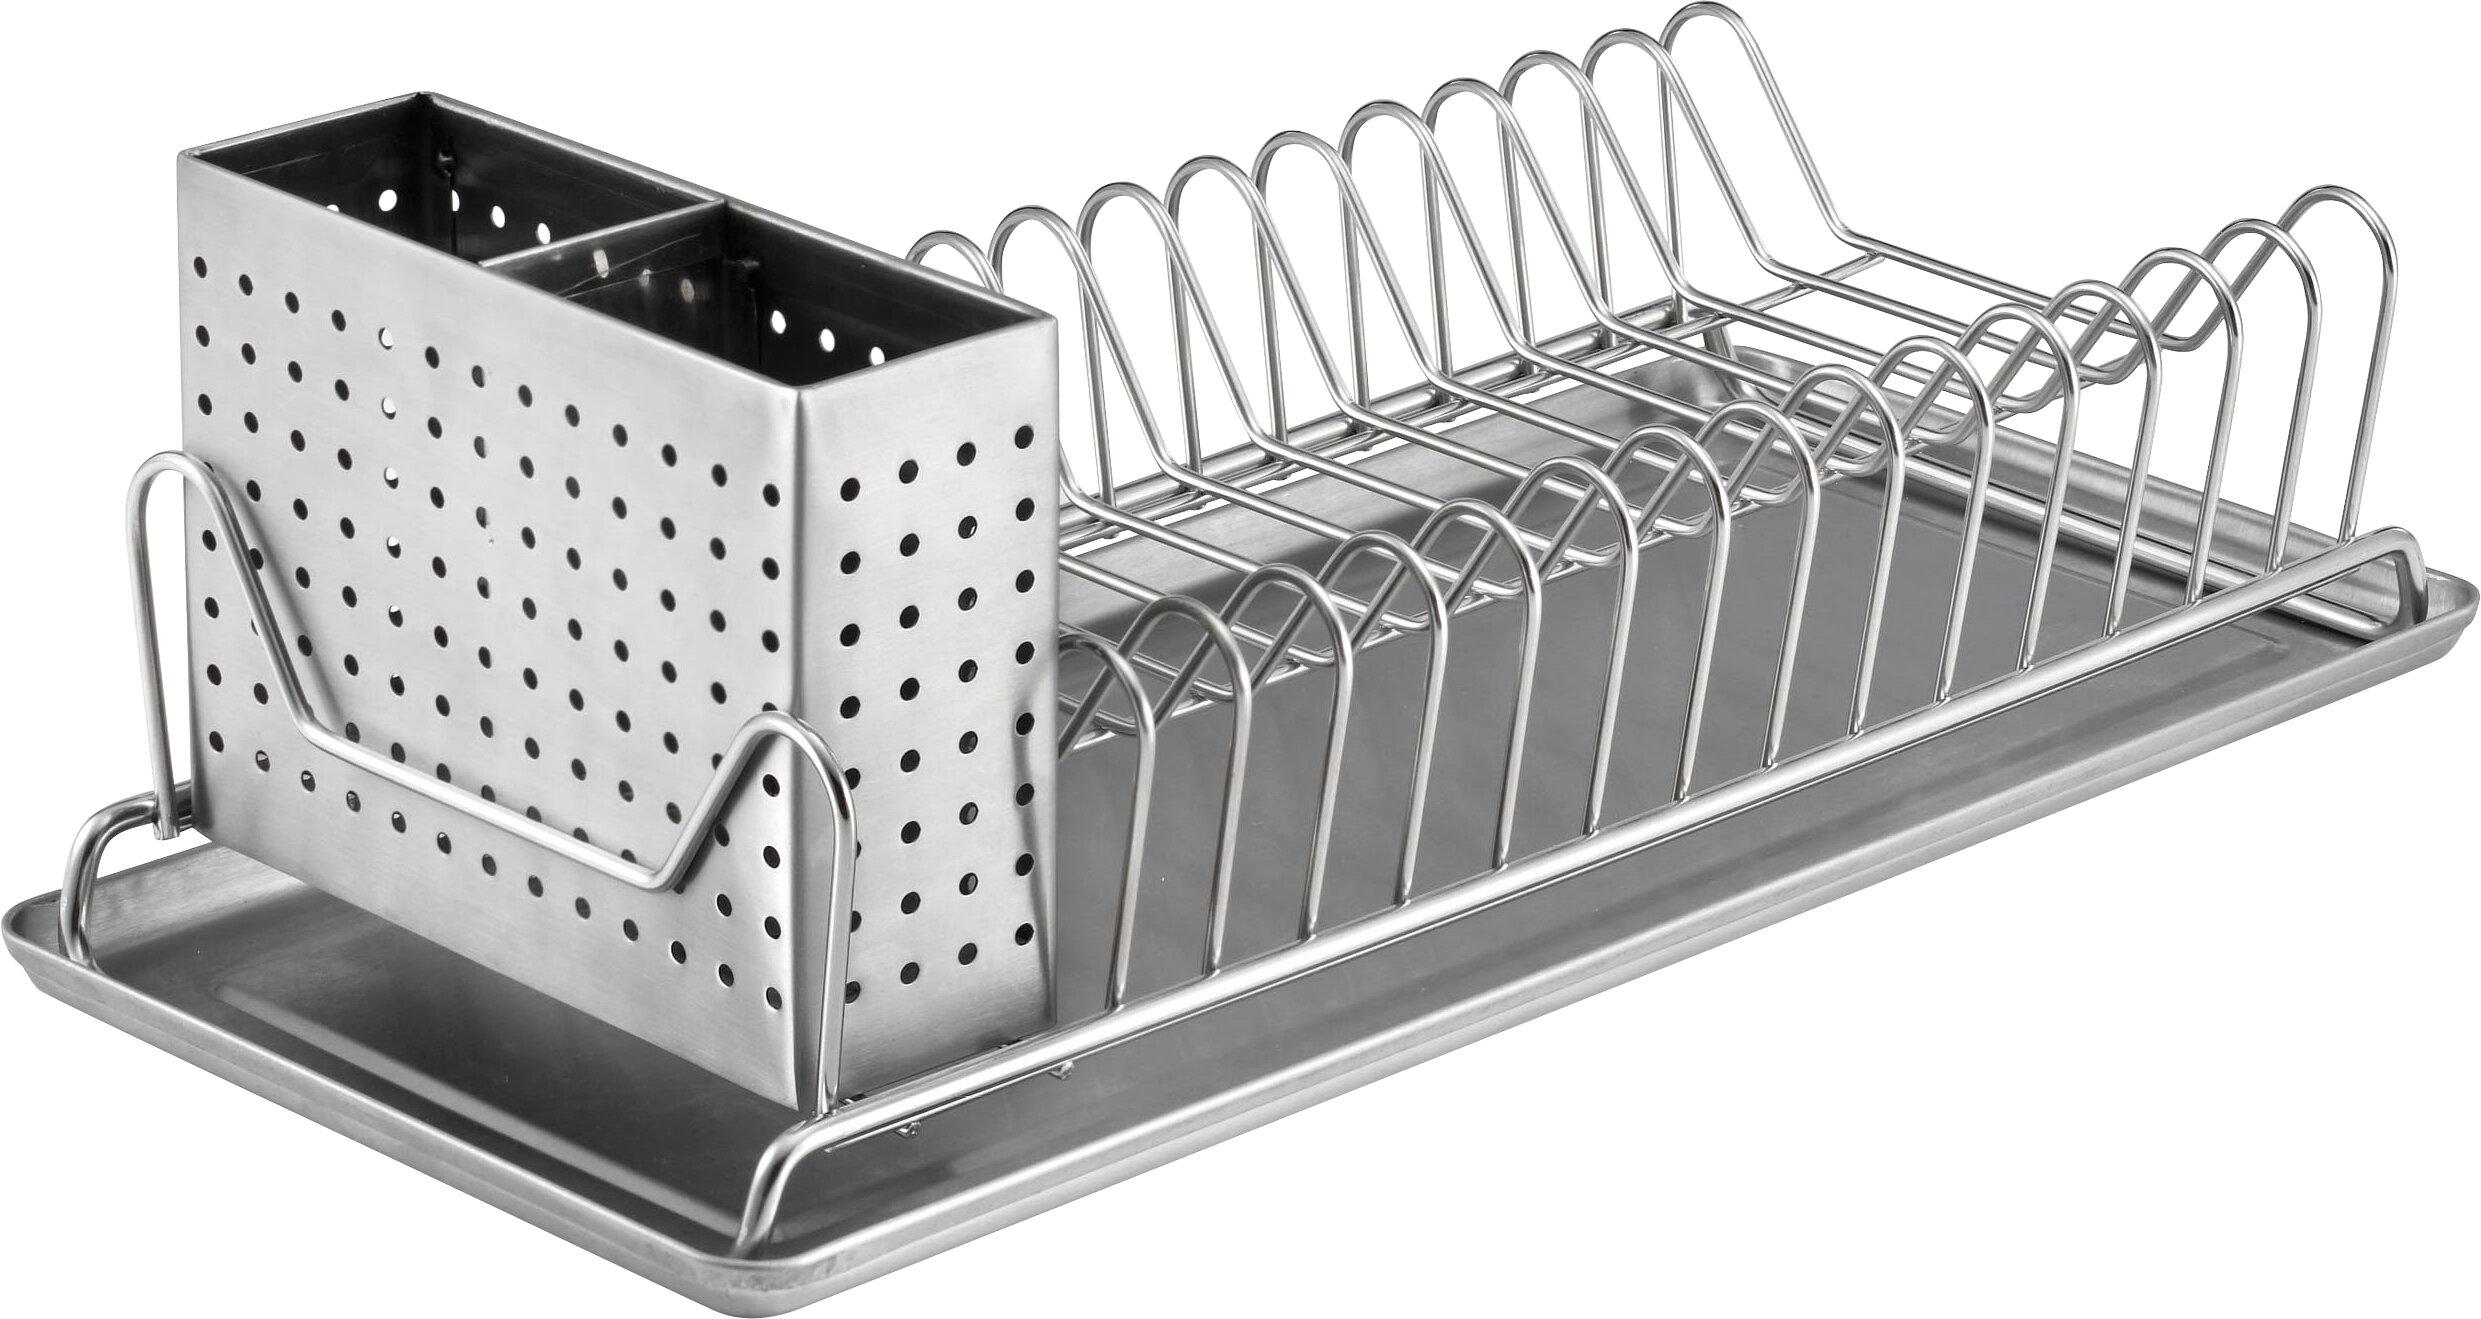 Polder Products LLC Compact Dish Rack & Reviews | Wayfair